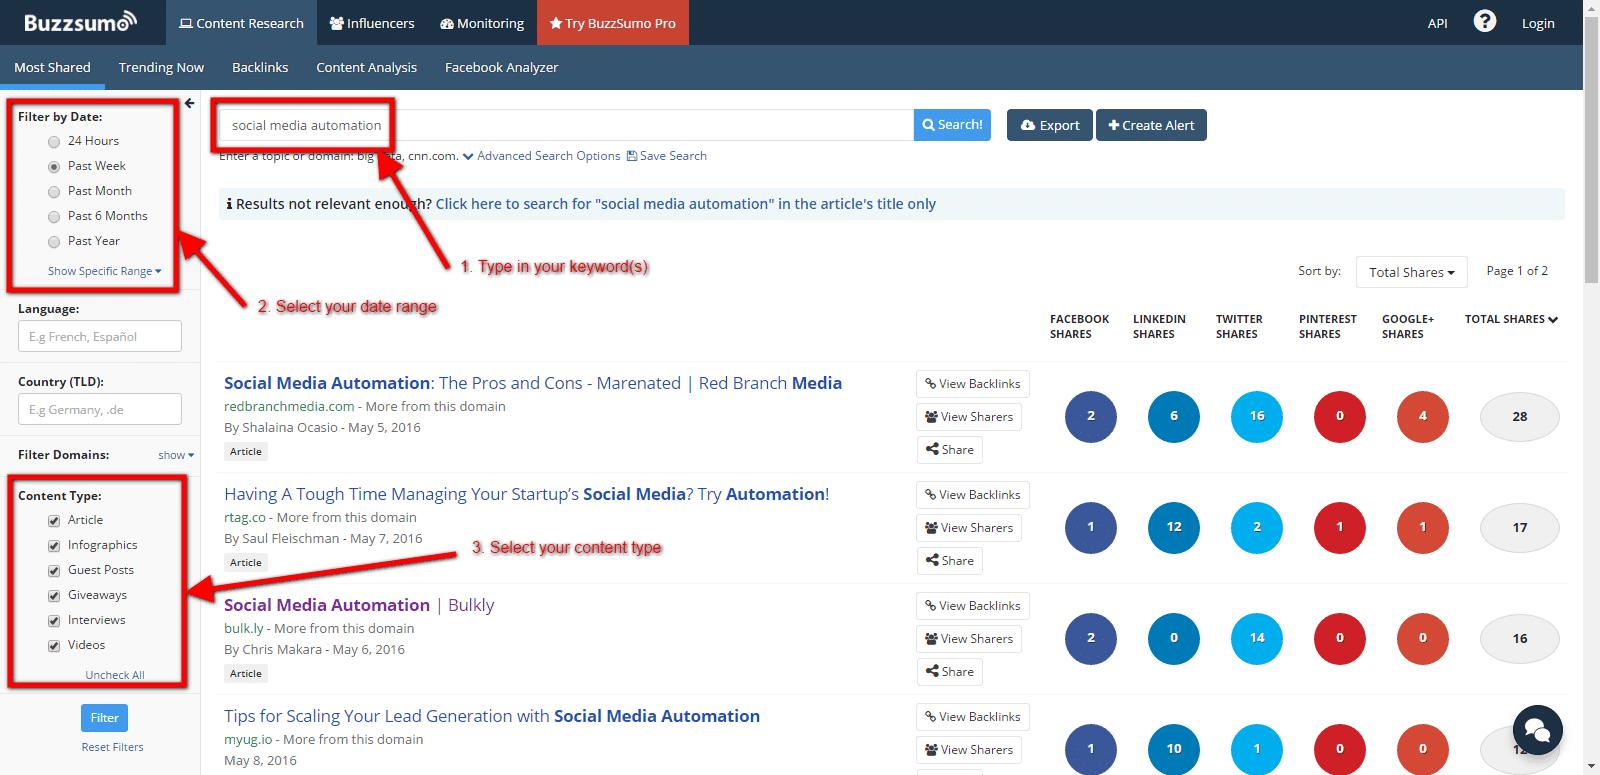 Buzzsumo-For-Social-Media-Content